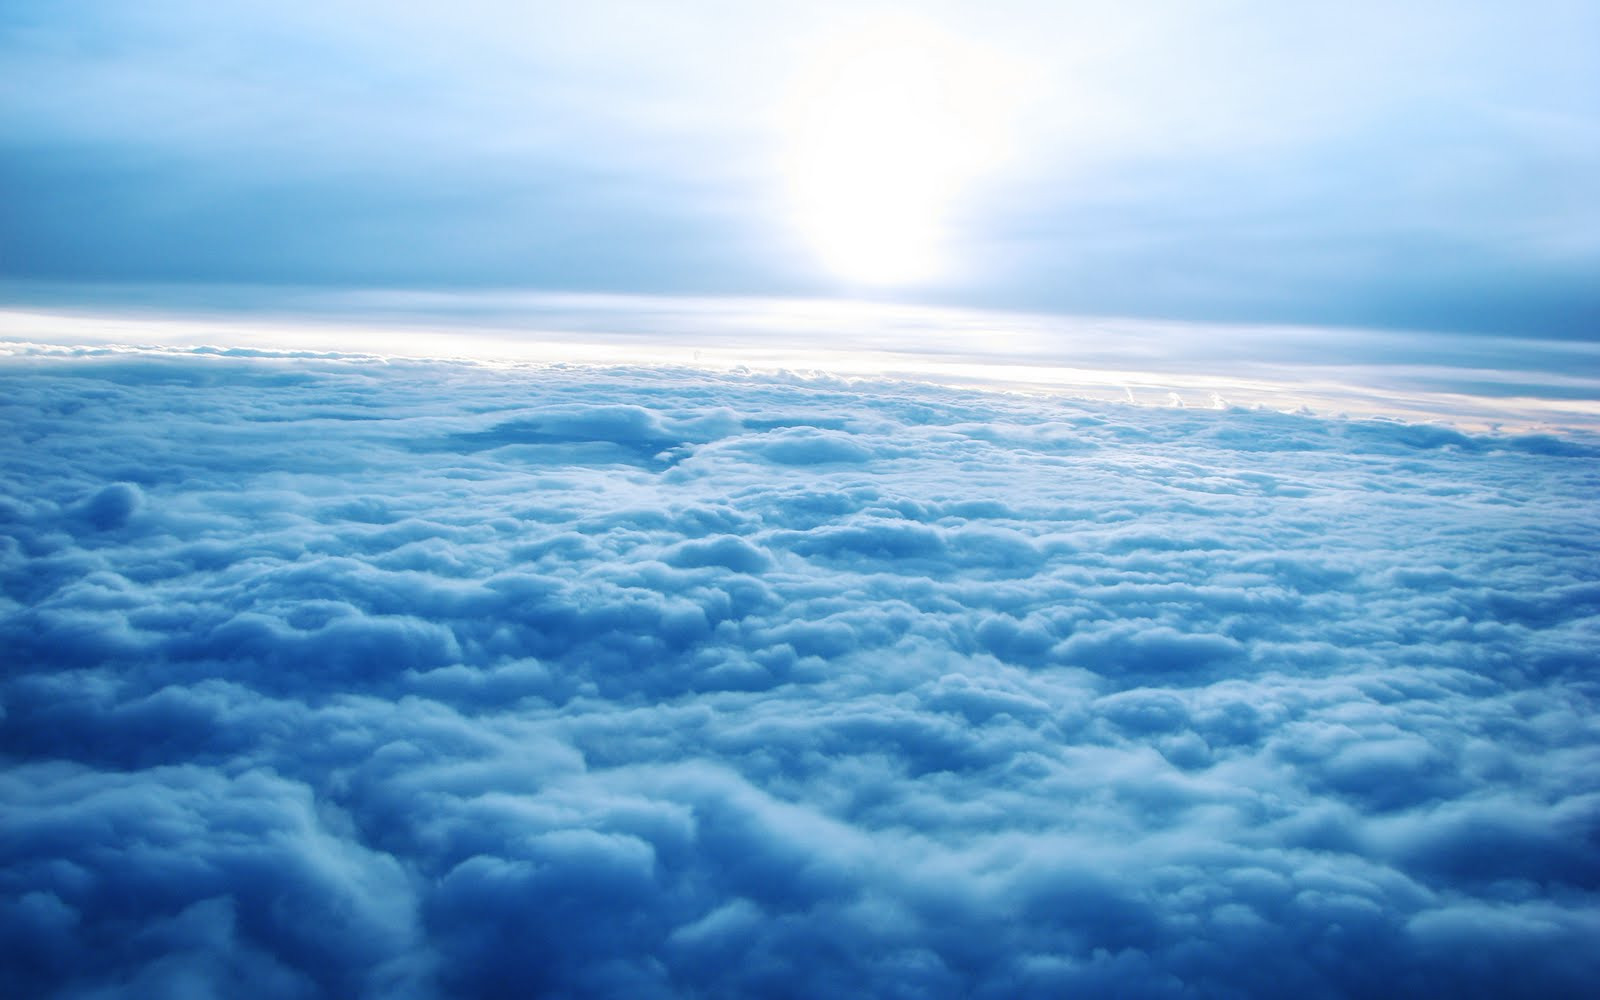 http://1.bp.blogspot.com/-i6OECVt90Lk/TelFBEzEsjI/AAAAAAAACdk/2Et1Xi-Q0Ww/s1600/sky.jpg